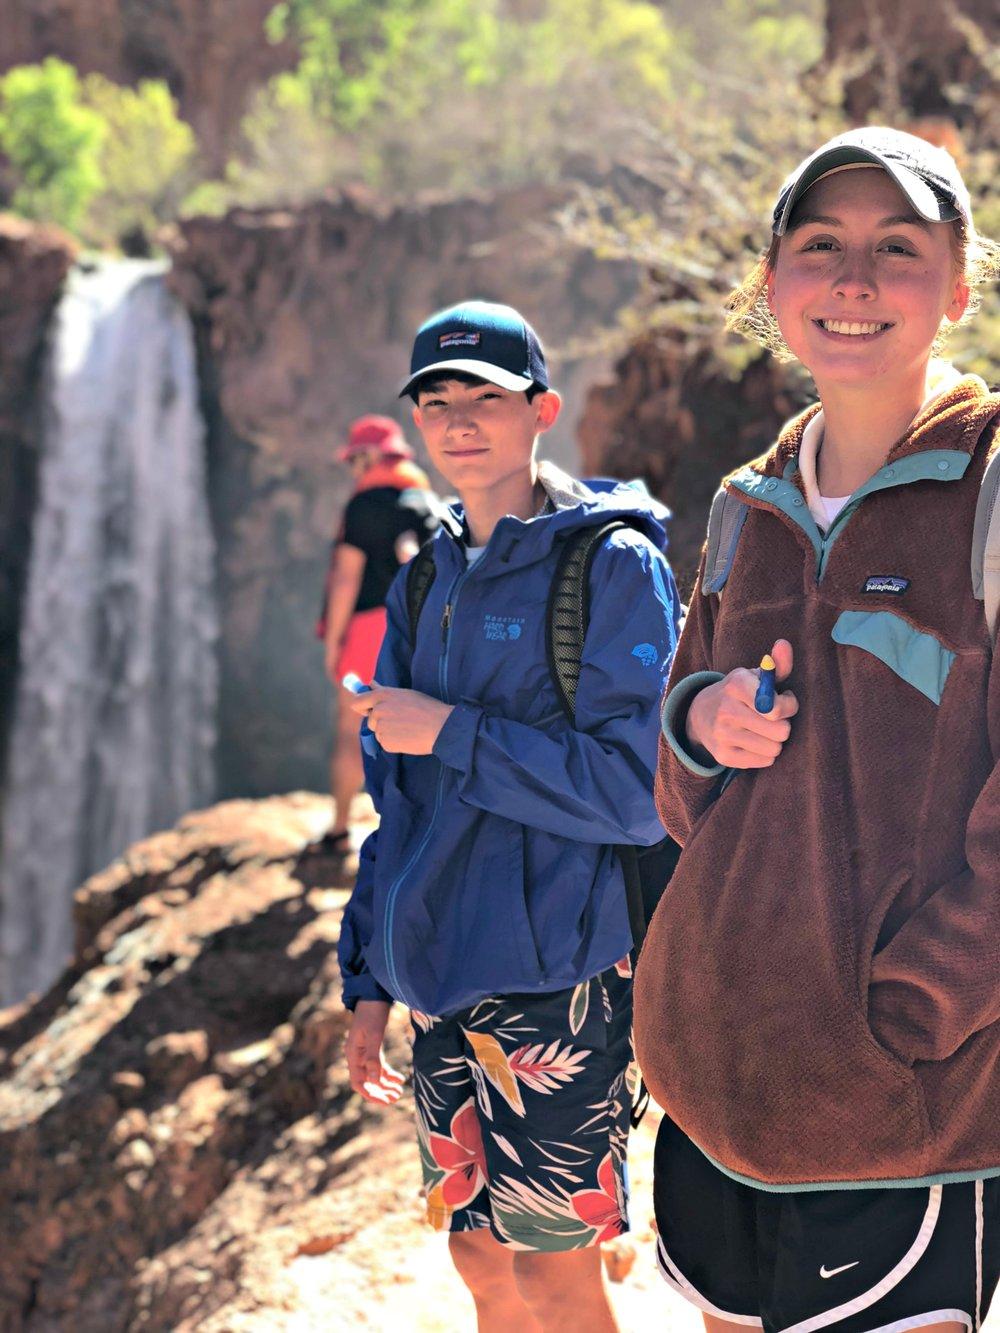 teens-before-climbing-down-mooney-falls-leader